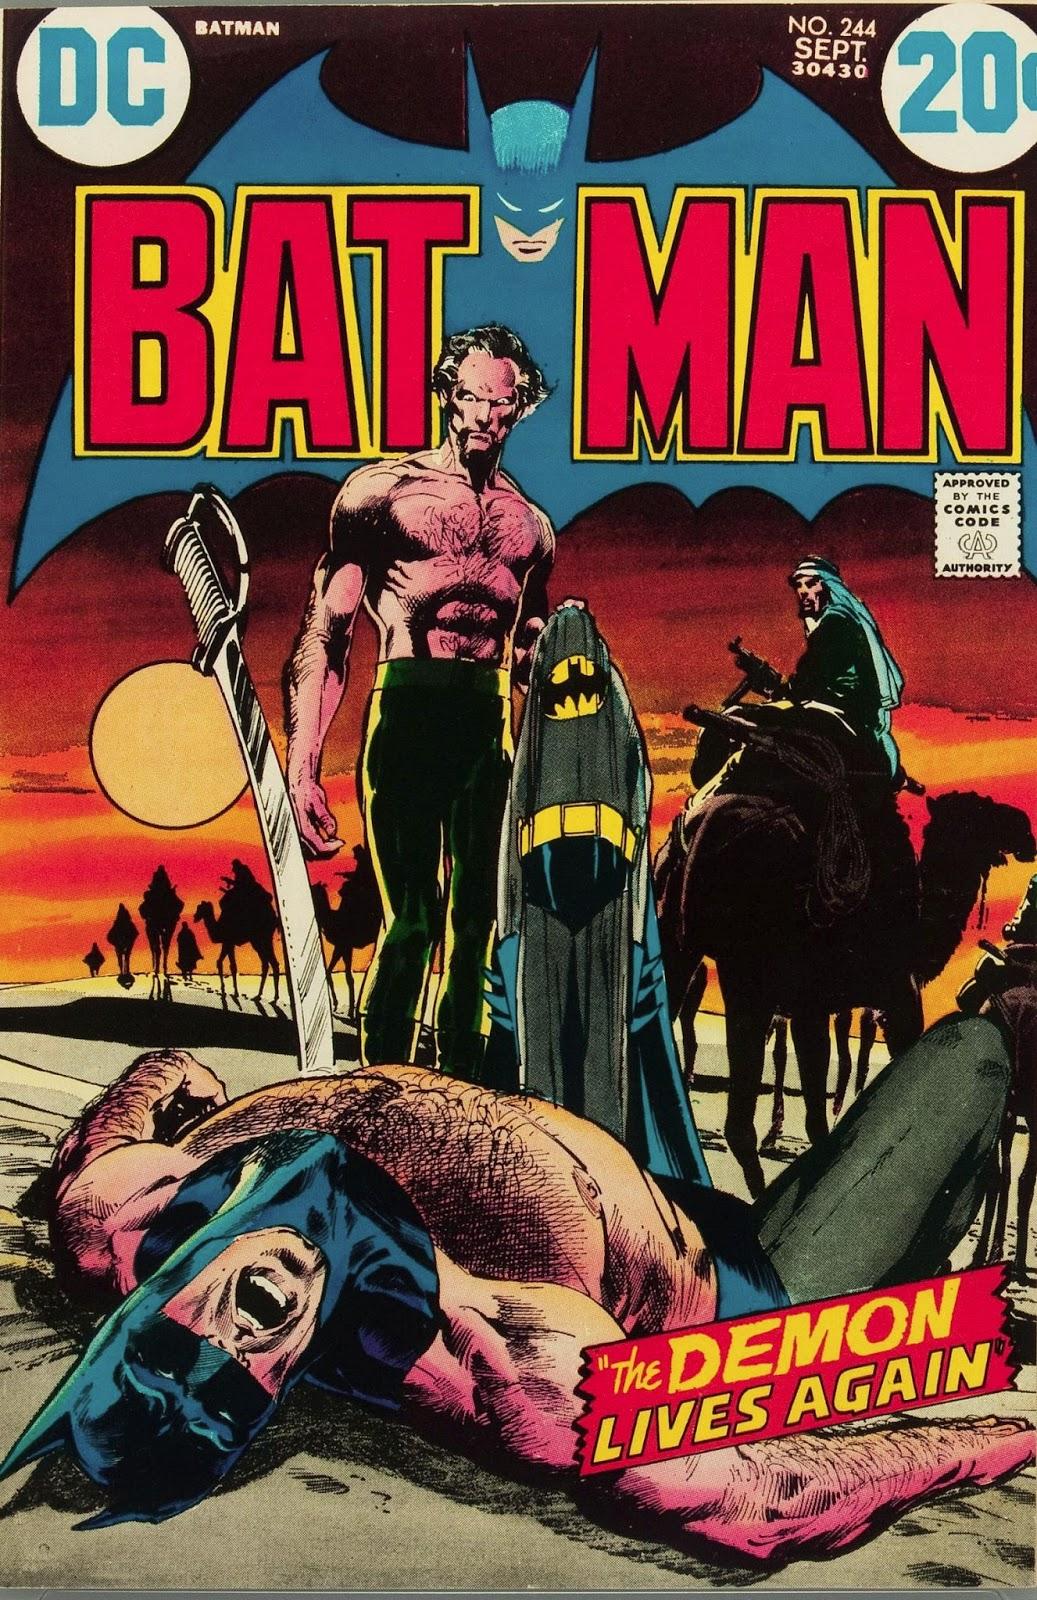 Capns Comics Ras Al Ghul by Neal Adams